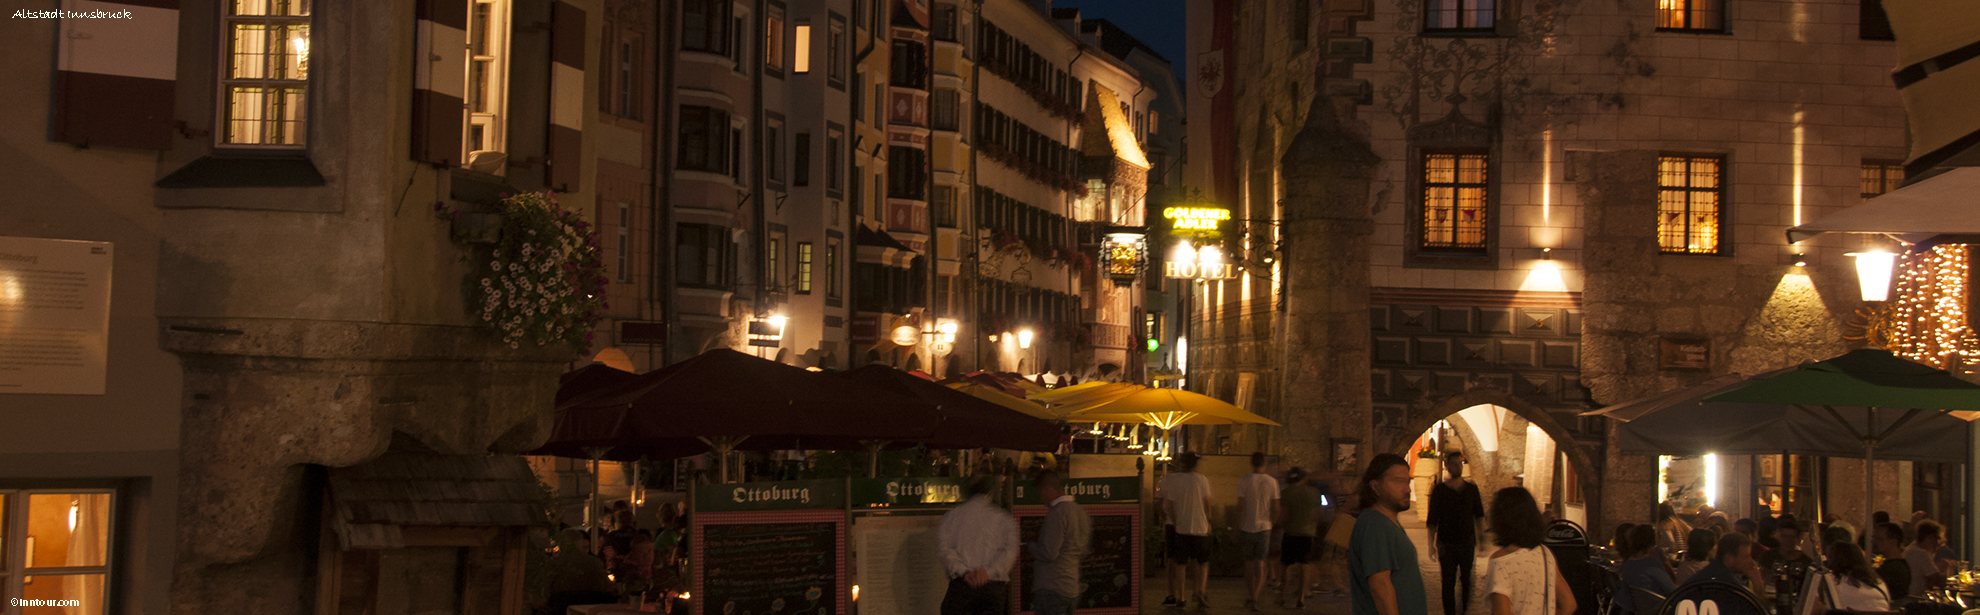 Oklassinntour_Innsbruck-Altstadt_DSC_2567